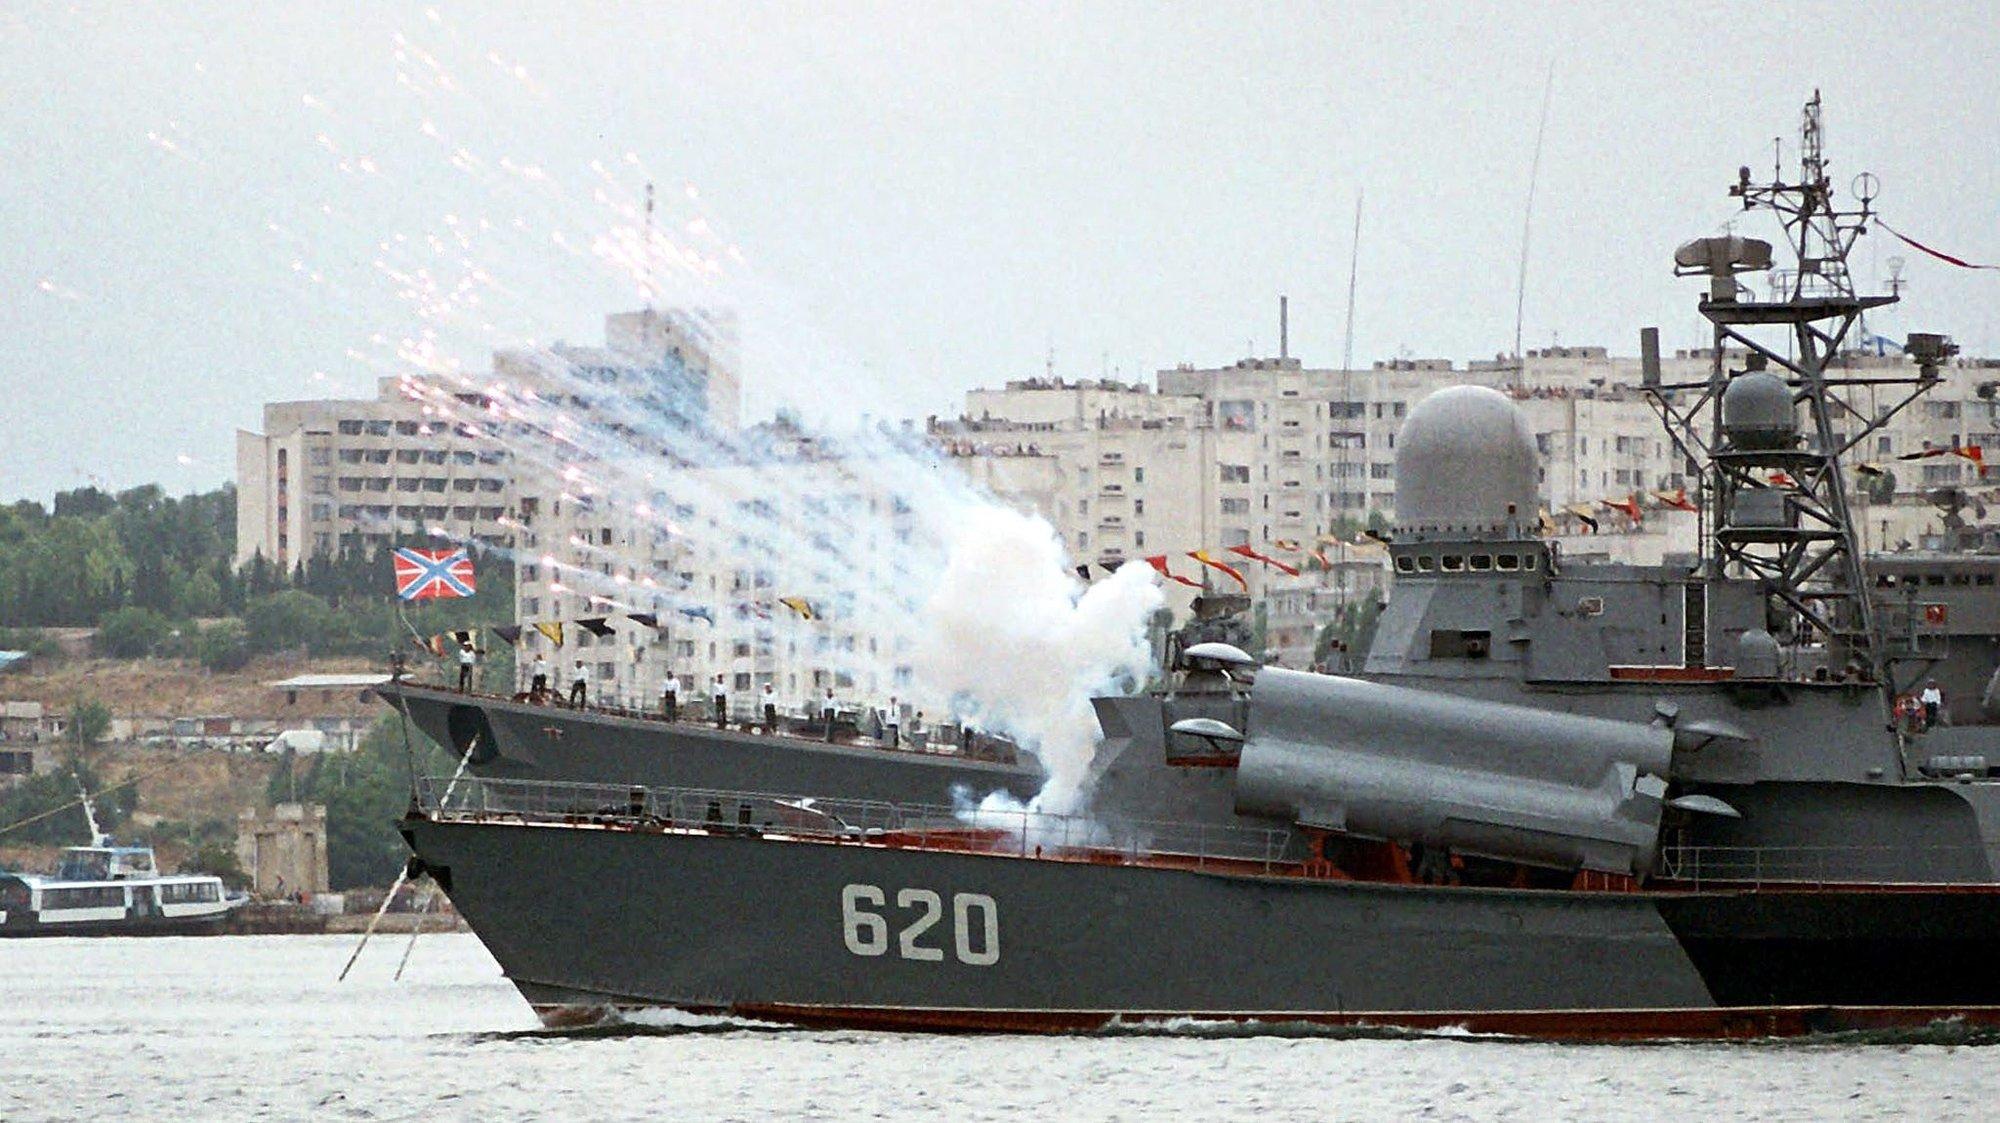 epa000239062 A battleship ship fires a salute during celebration of Russian Navy day at Sebastopol, Ukraine, Sunday 25 July 2004. Russian Navy use Ukrainian city Sebastopol as base on the Black Sea.  EPA/SERGEY SVETLITSKIY